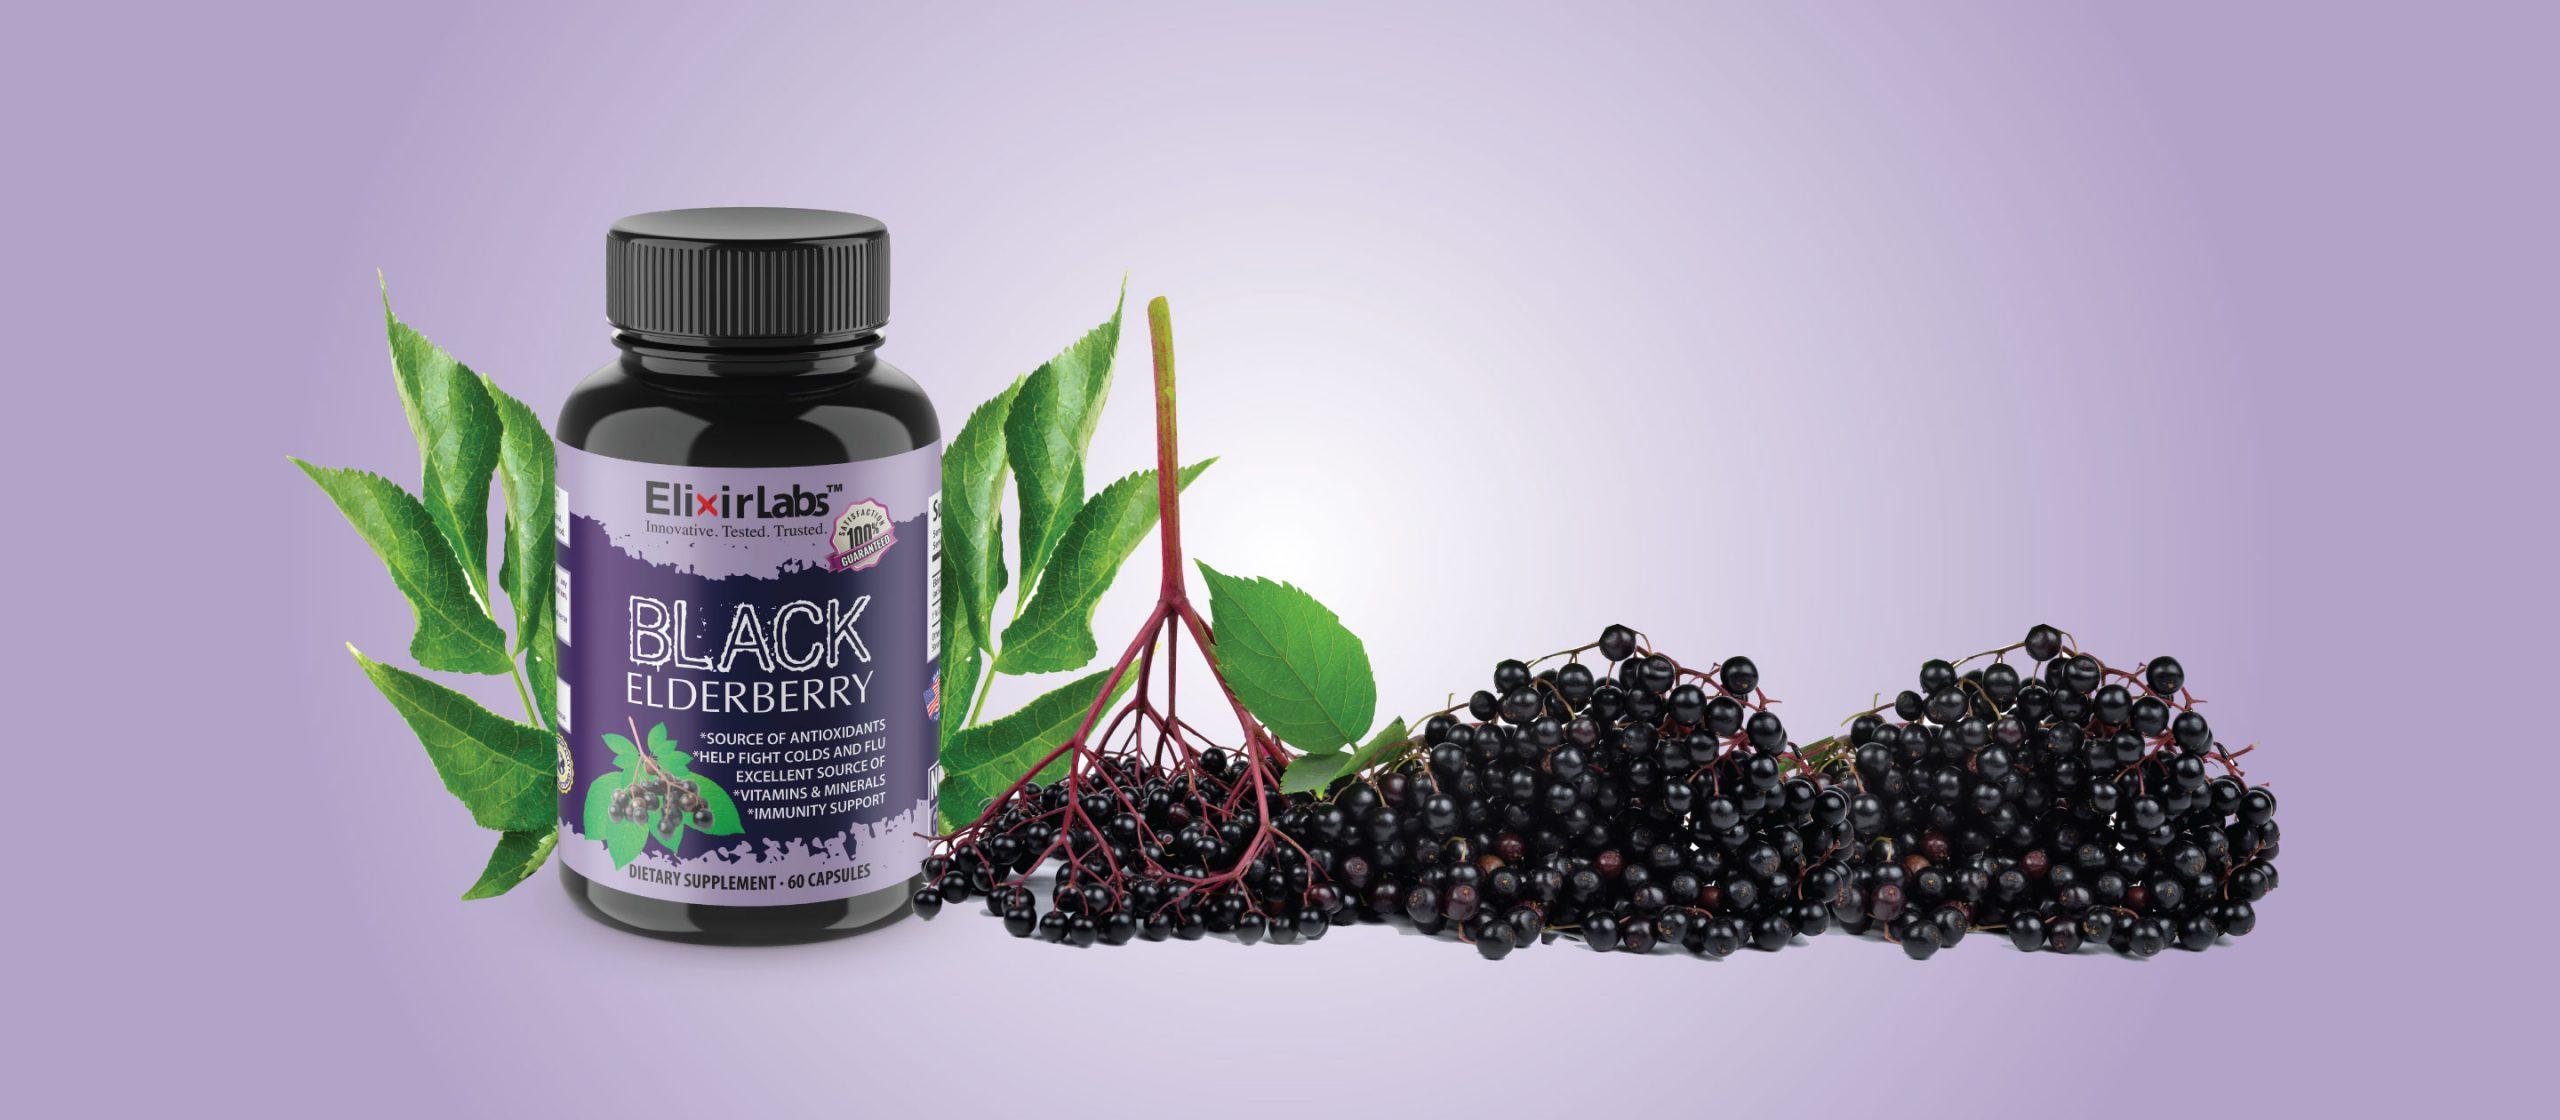 Black Elderberry for a Strong Immune System